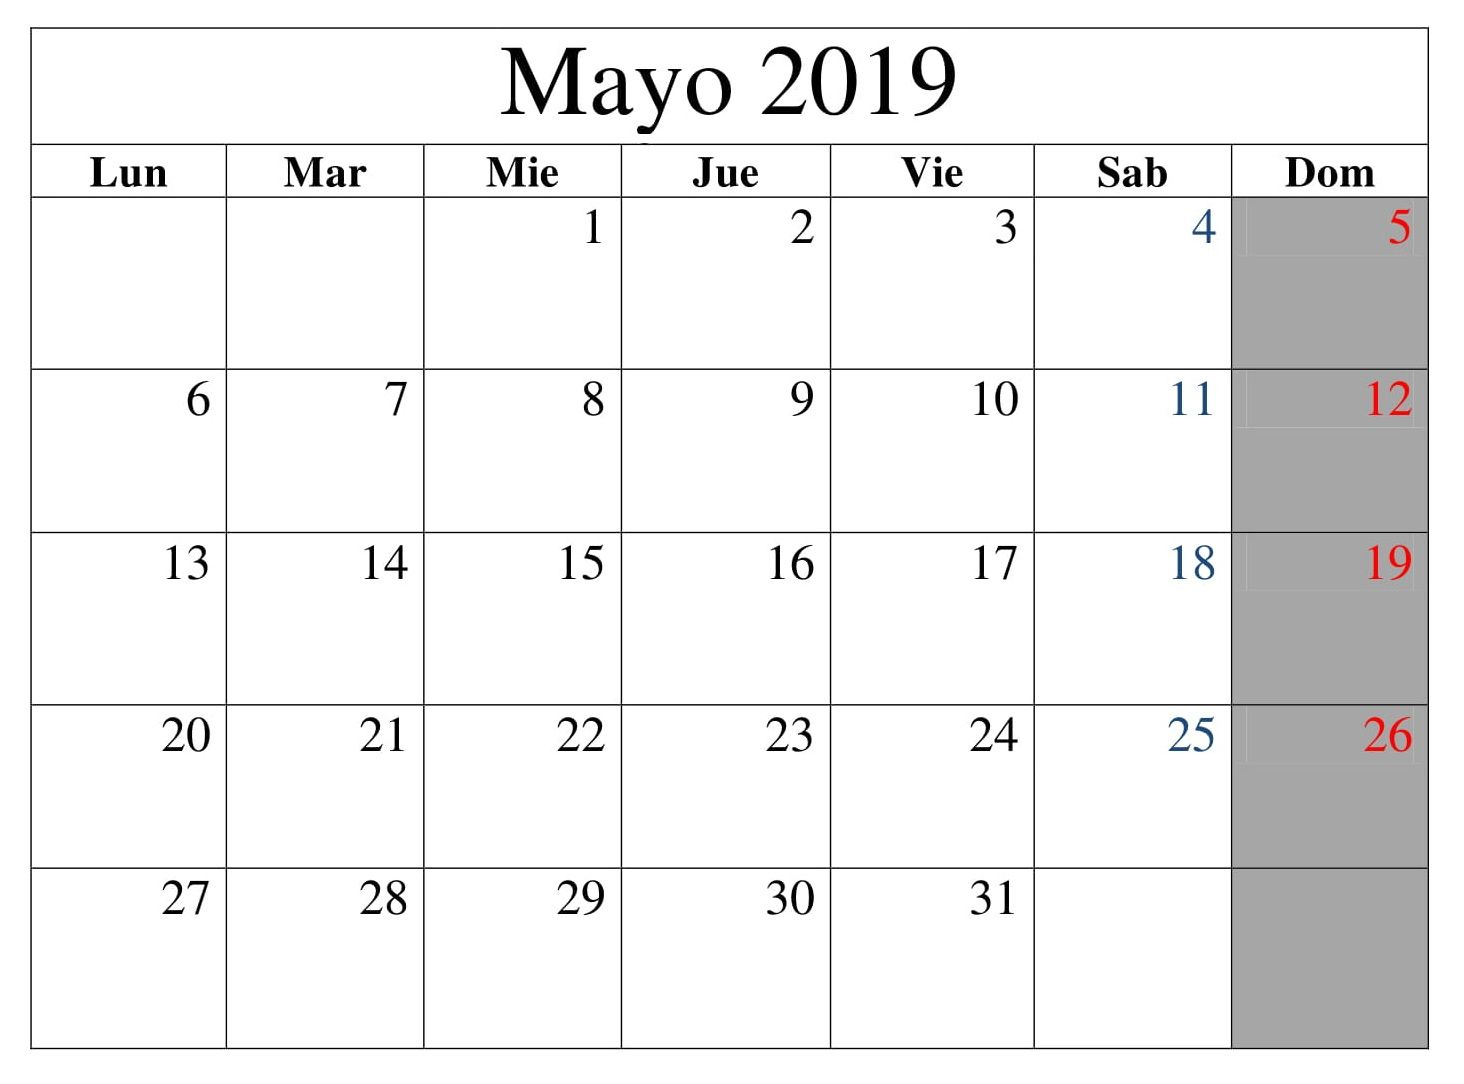 Calendario Grande.Mayo Calendario Grande 2019 Calendario Mayo 2019 Blank